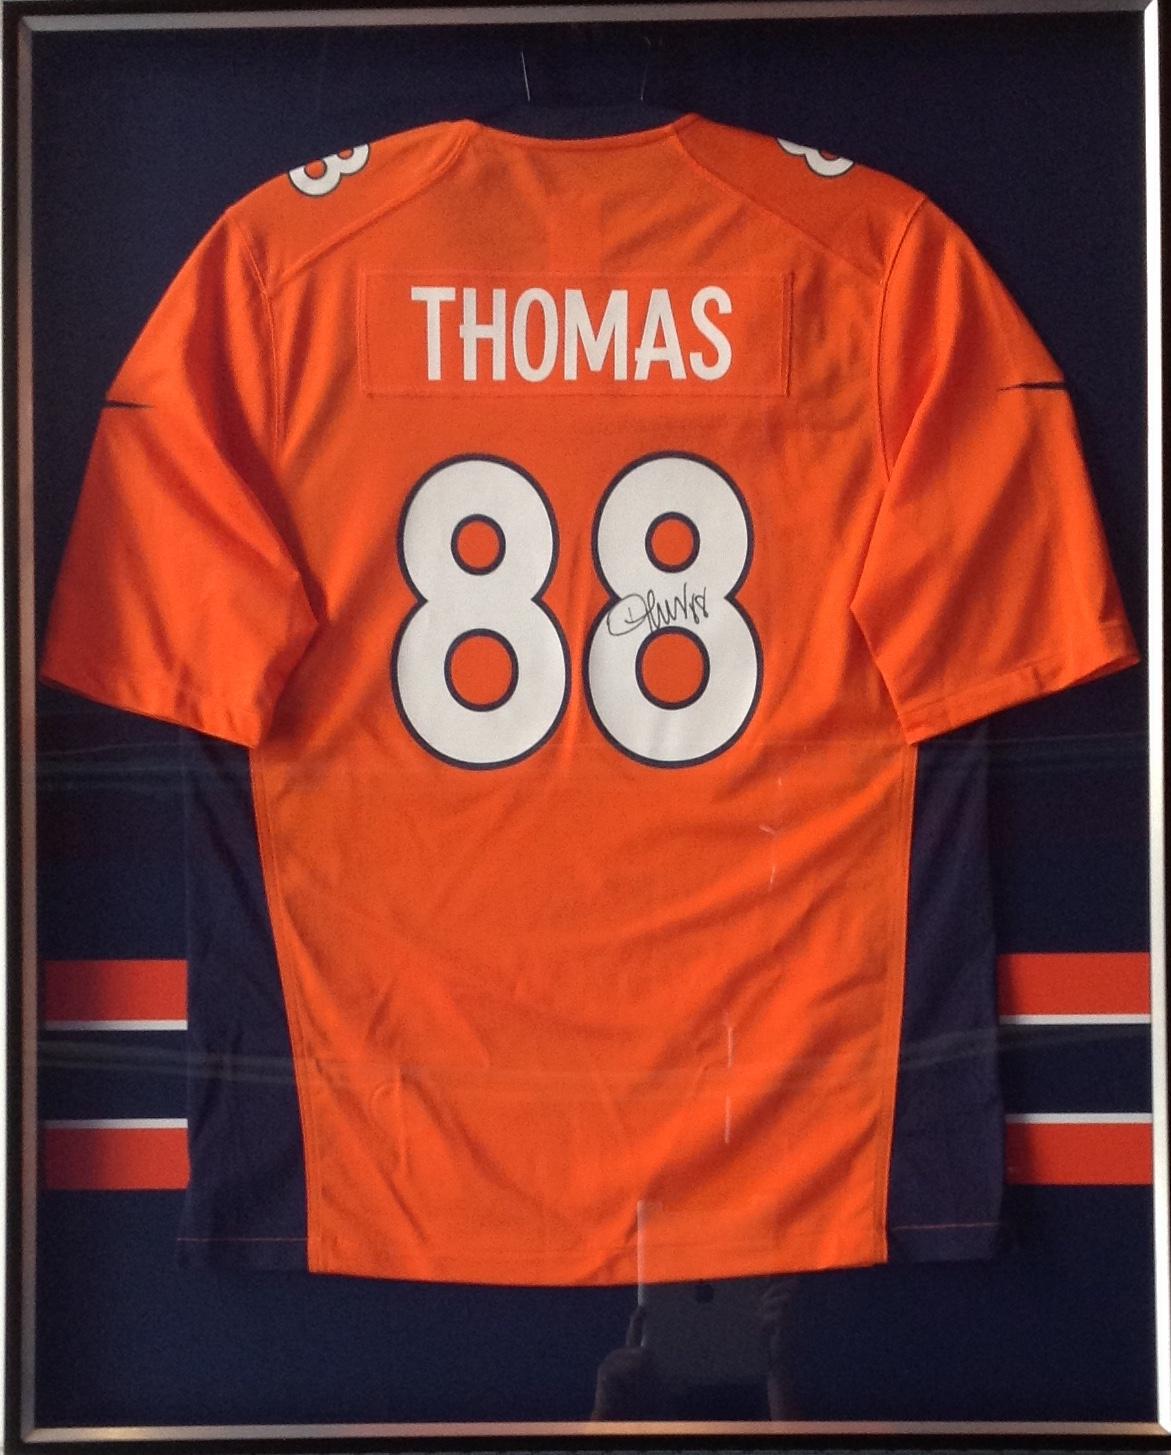 Demarius Thomas jersey with custom mat stripes